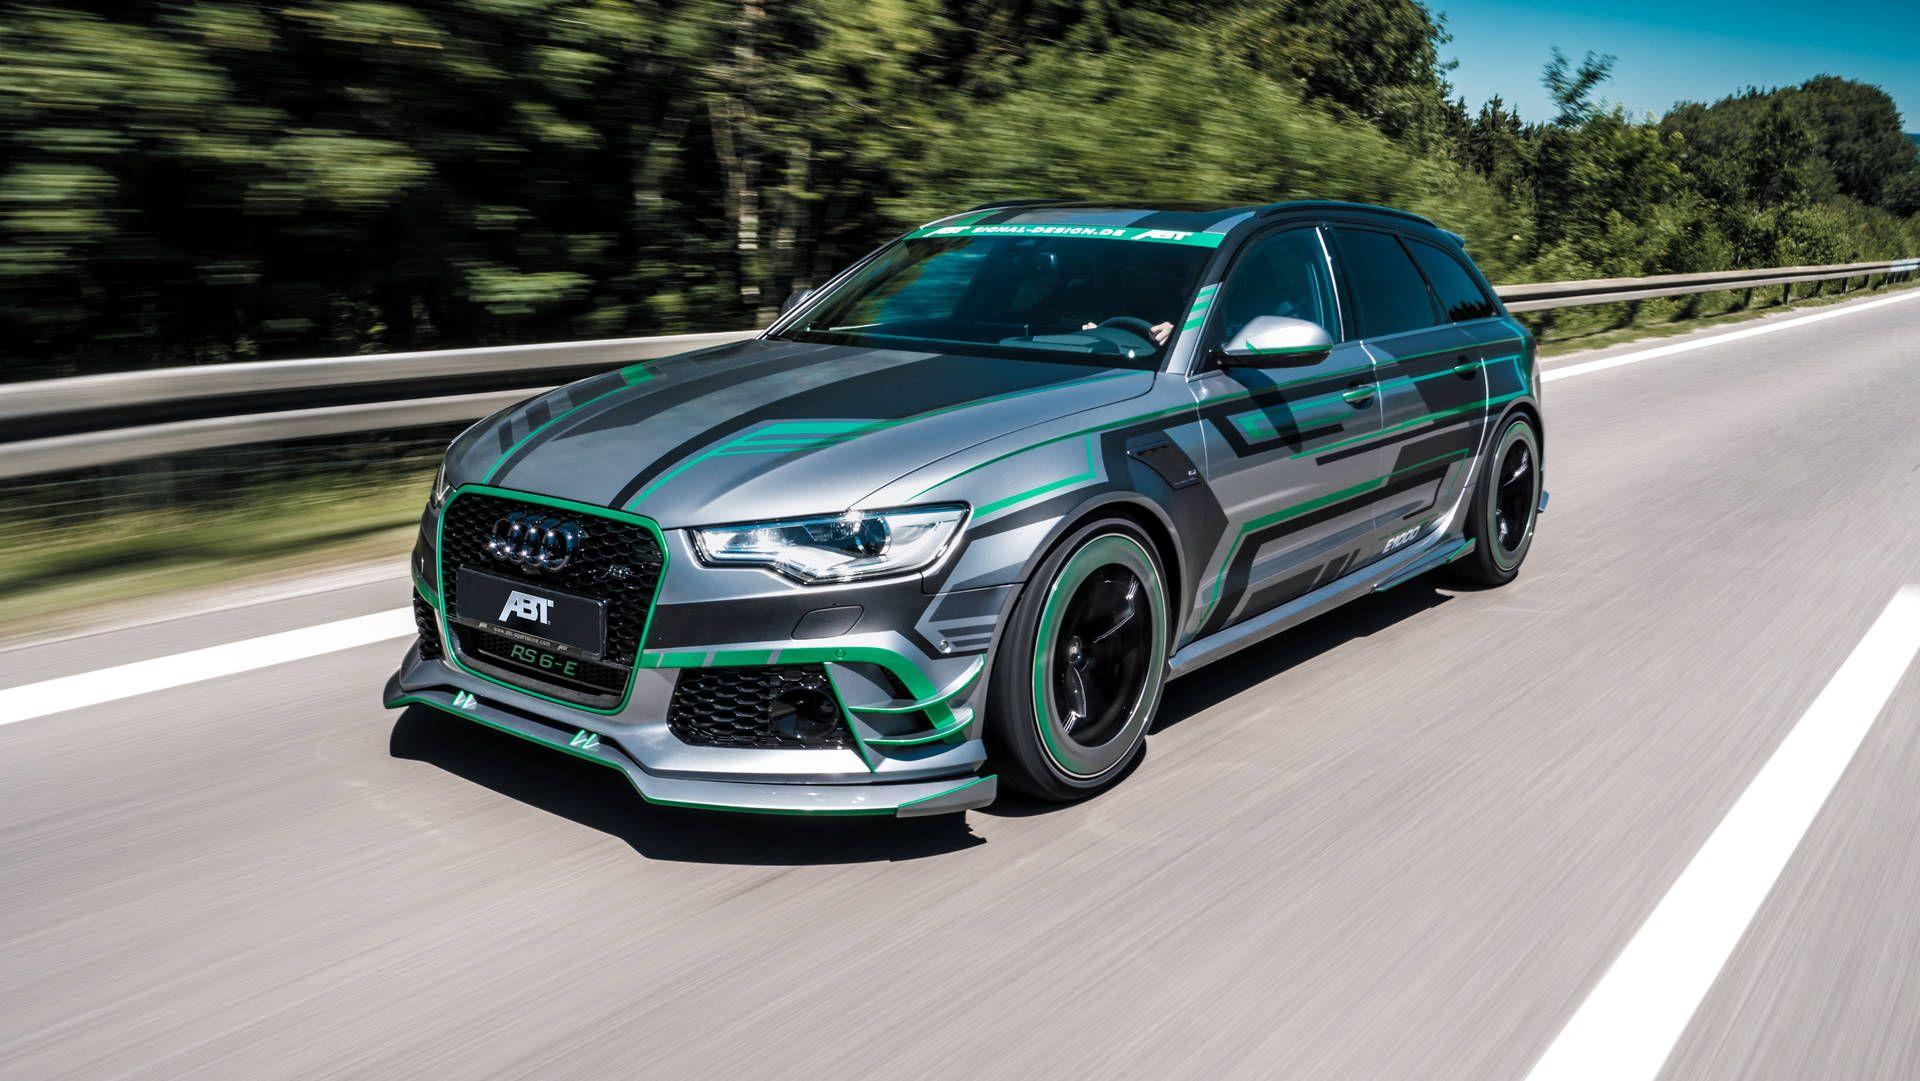 Officieel De Audi Rs 6 E Van Abt Met 1 018 Pk En 1 291 Nm Audi Rs6 Audi Rs Audi